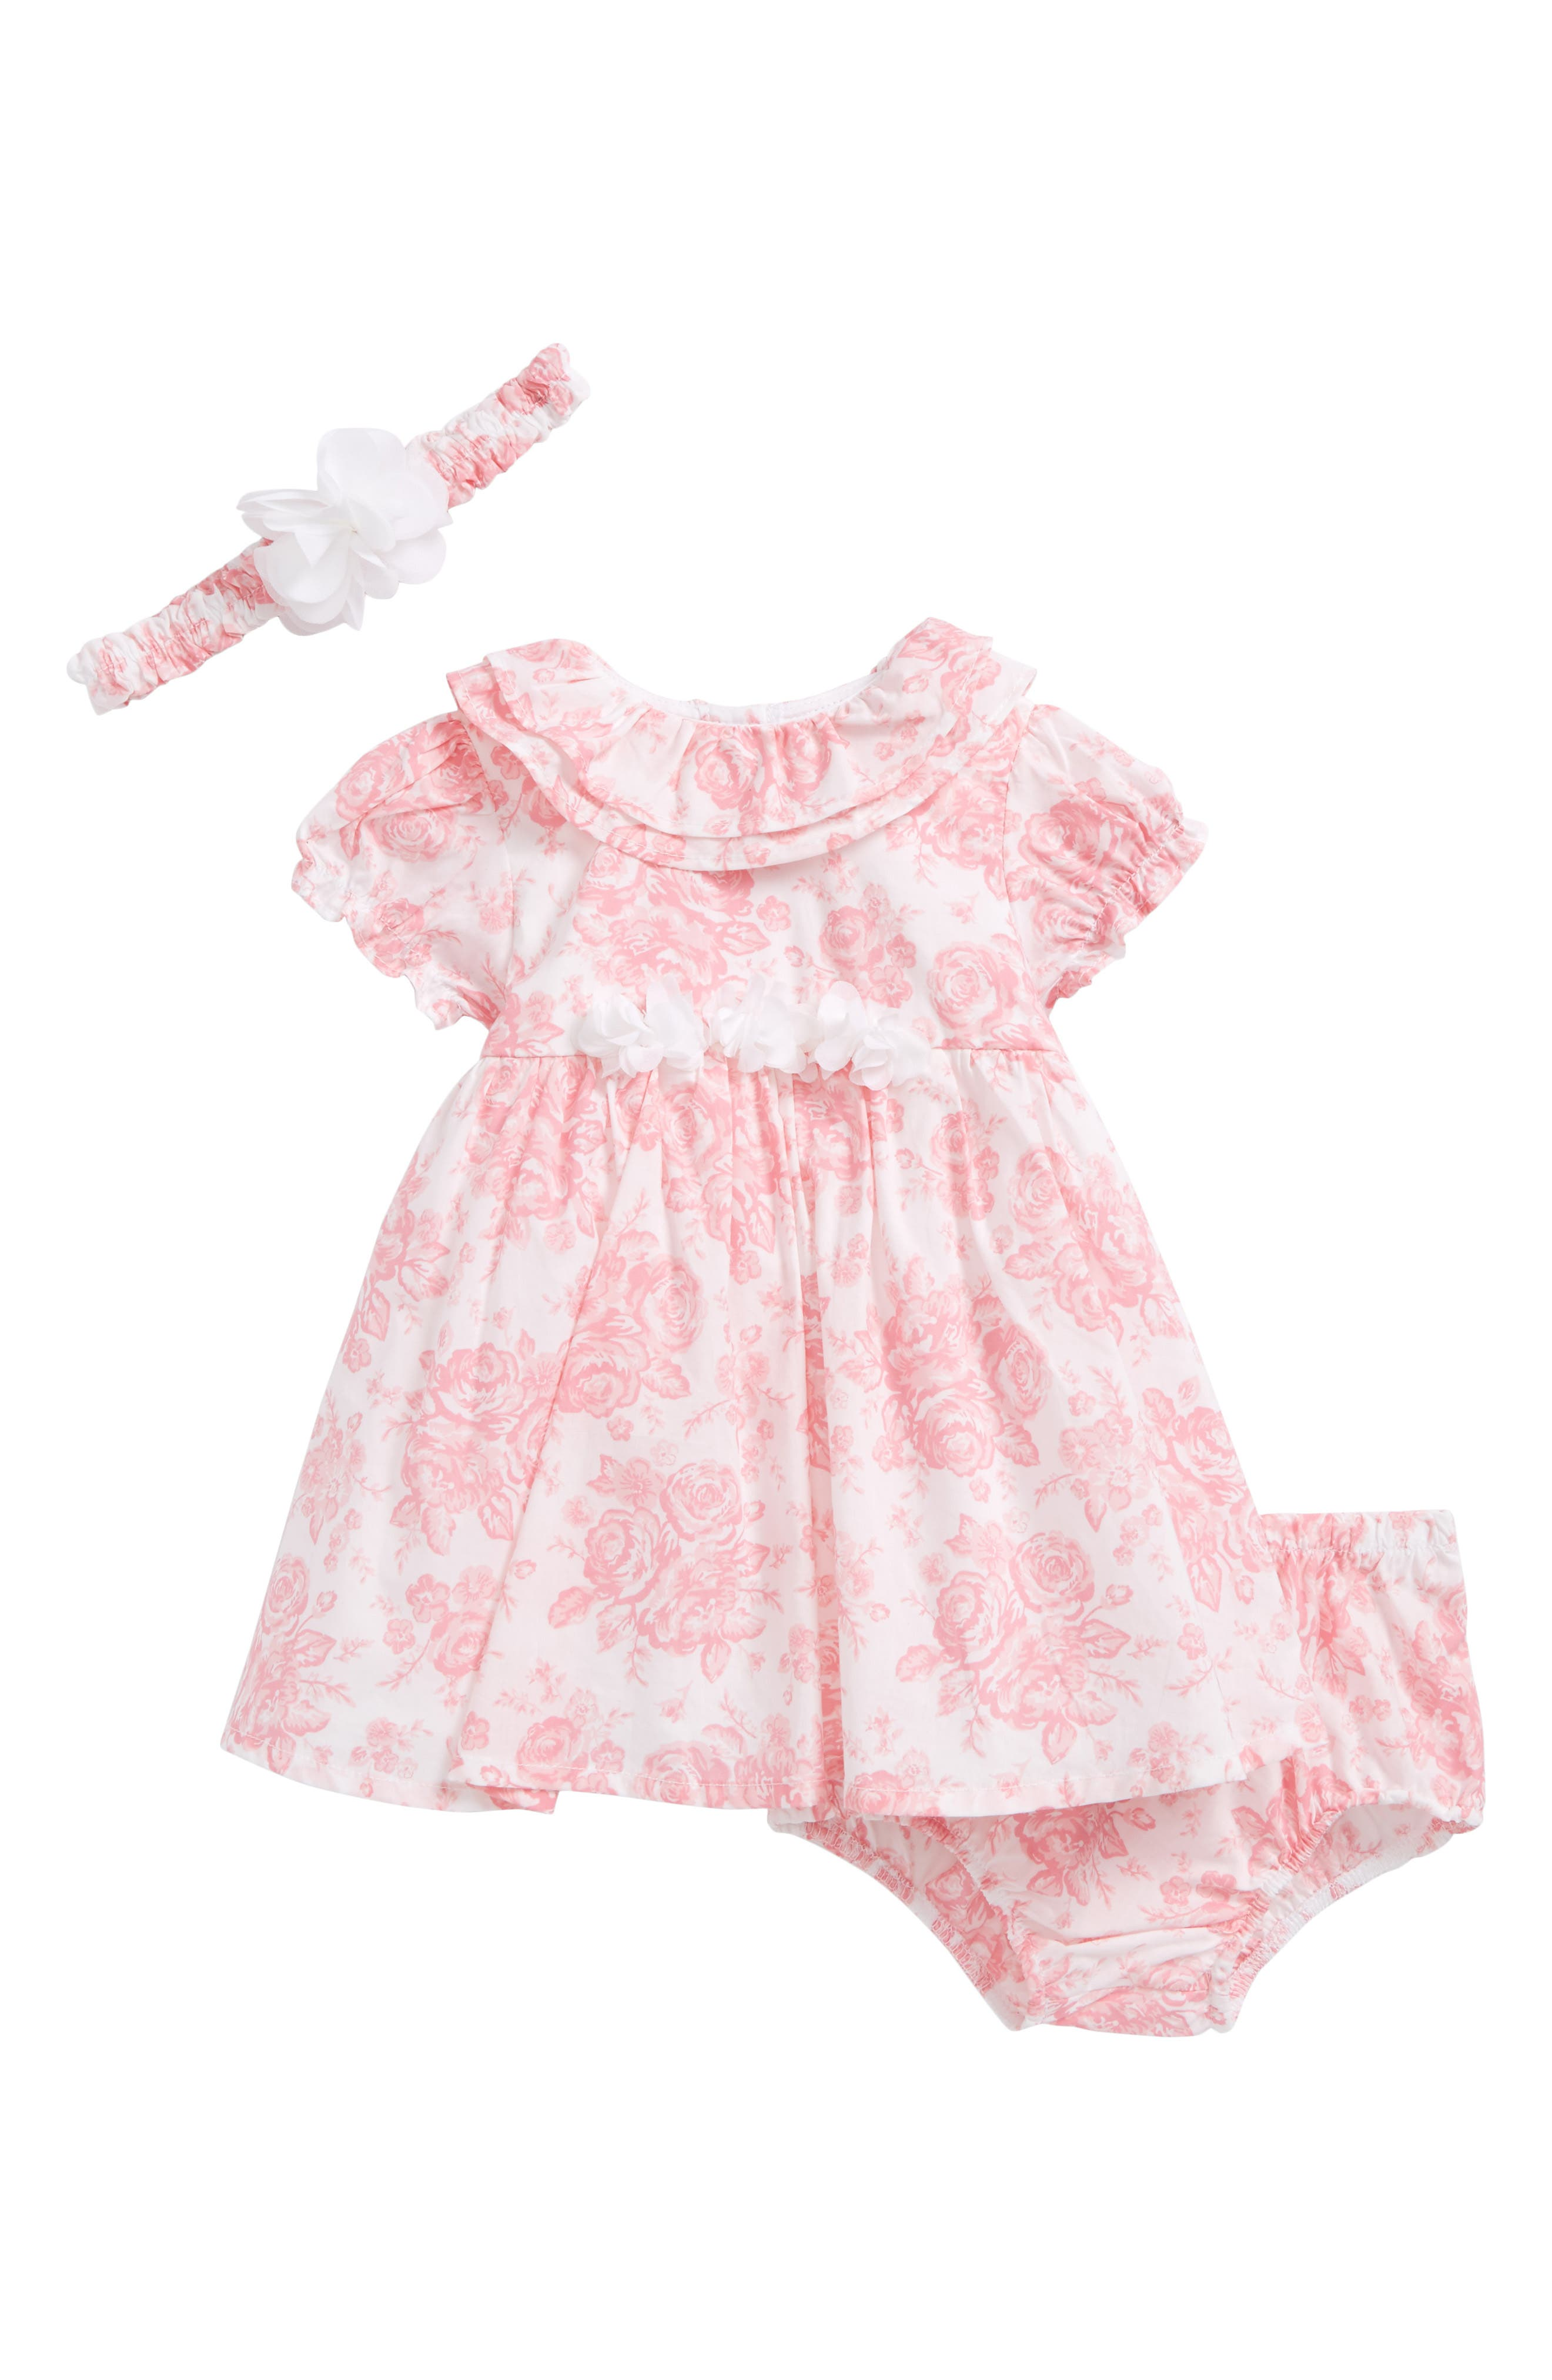 Rose Bouquet Dress & Headband Set,                             Main thumbnail 1, color,                             White/ Pink